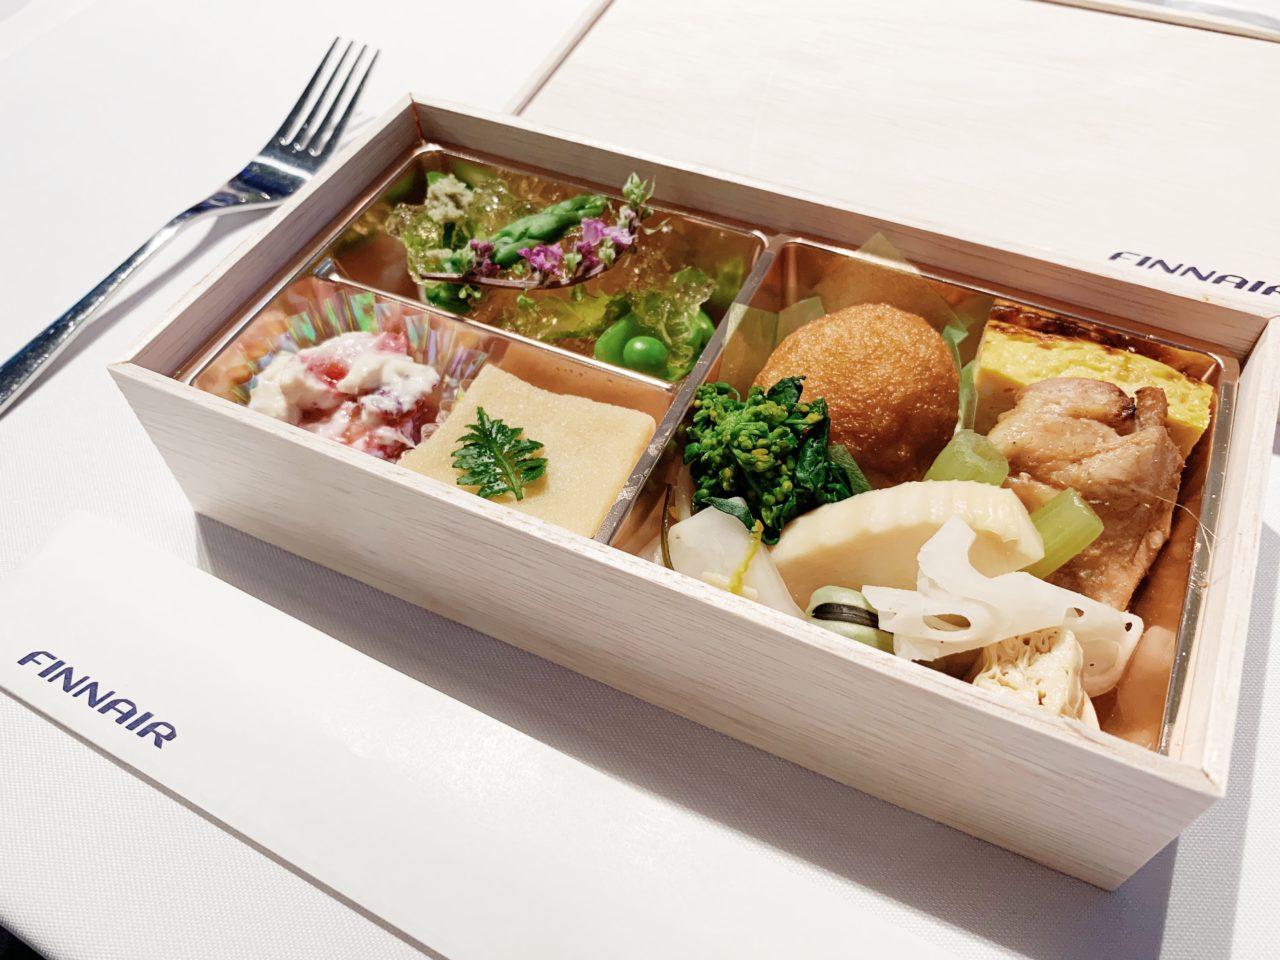 fbdcf70a 51aa 4464 902b 1ca3ac78db11 - HEAR THE TASTE DINNER - おいしさを耳でも感じるフィンエアーの魅力的な北欧料理